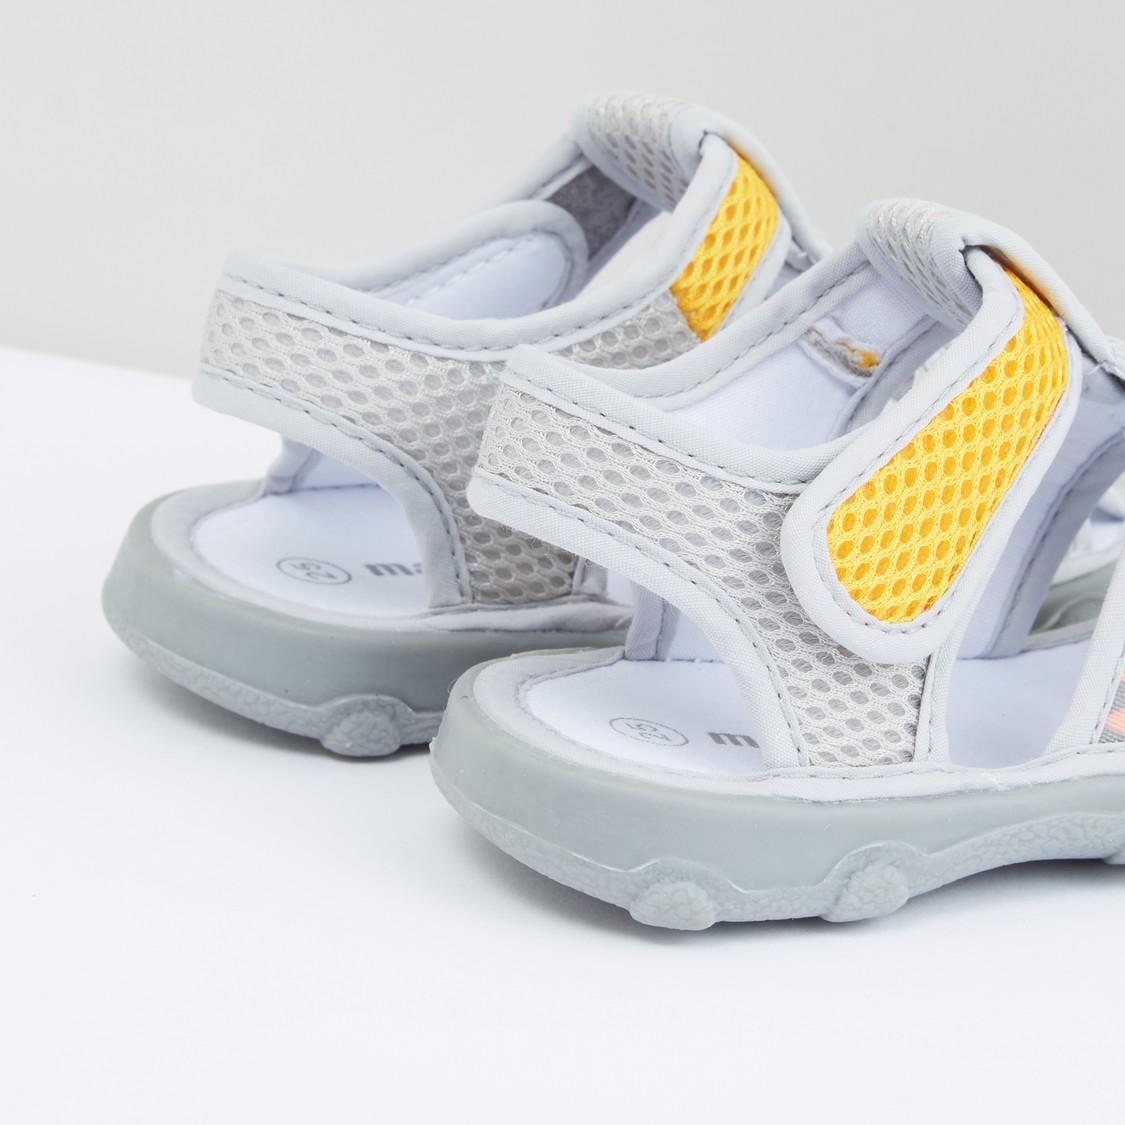 Mesh Detail Sandals with Hook and Loop Closure